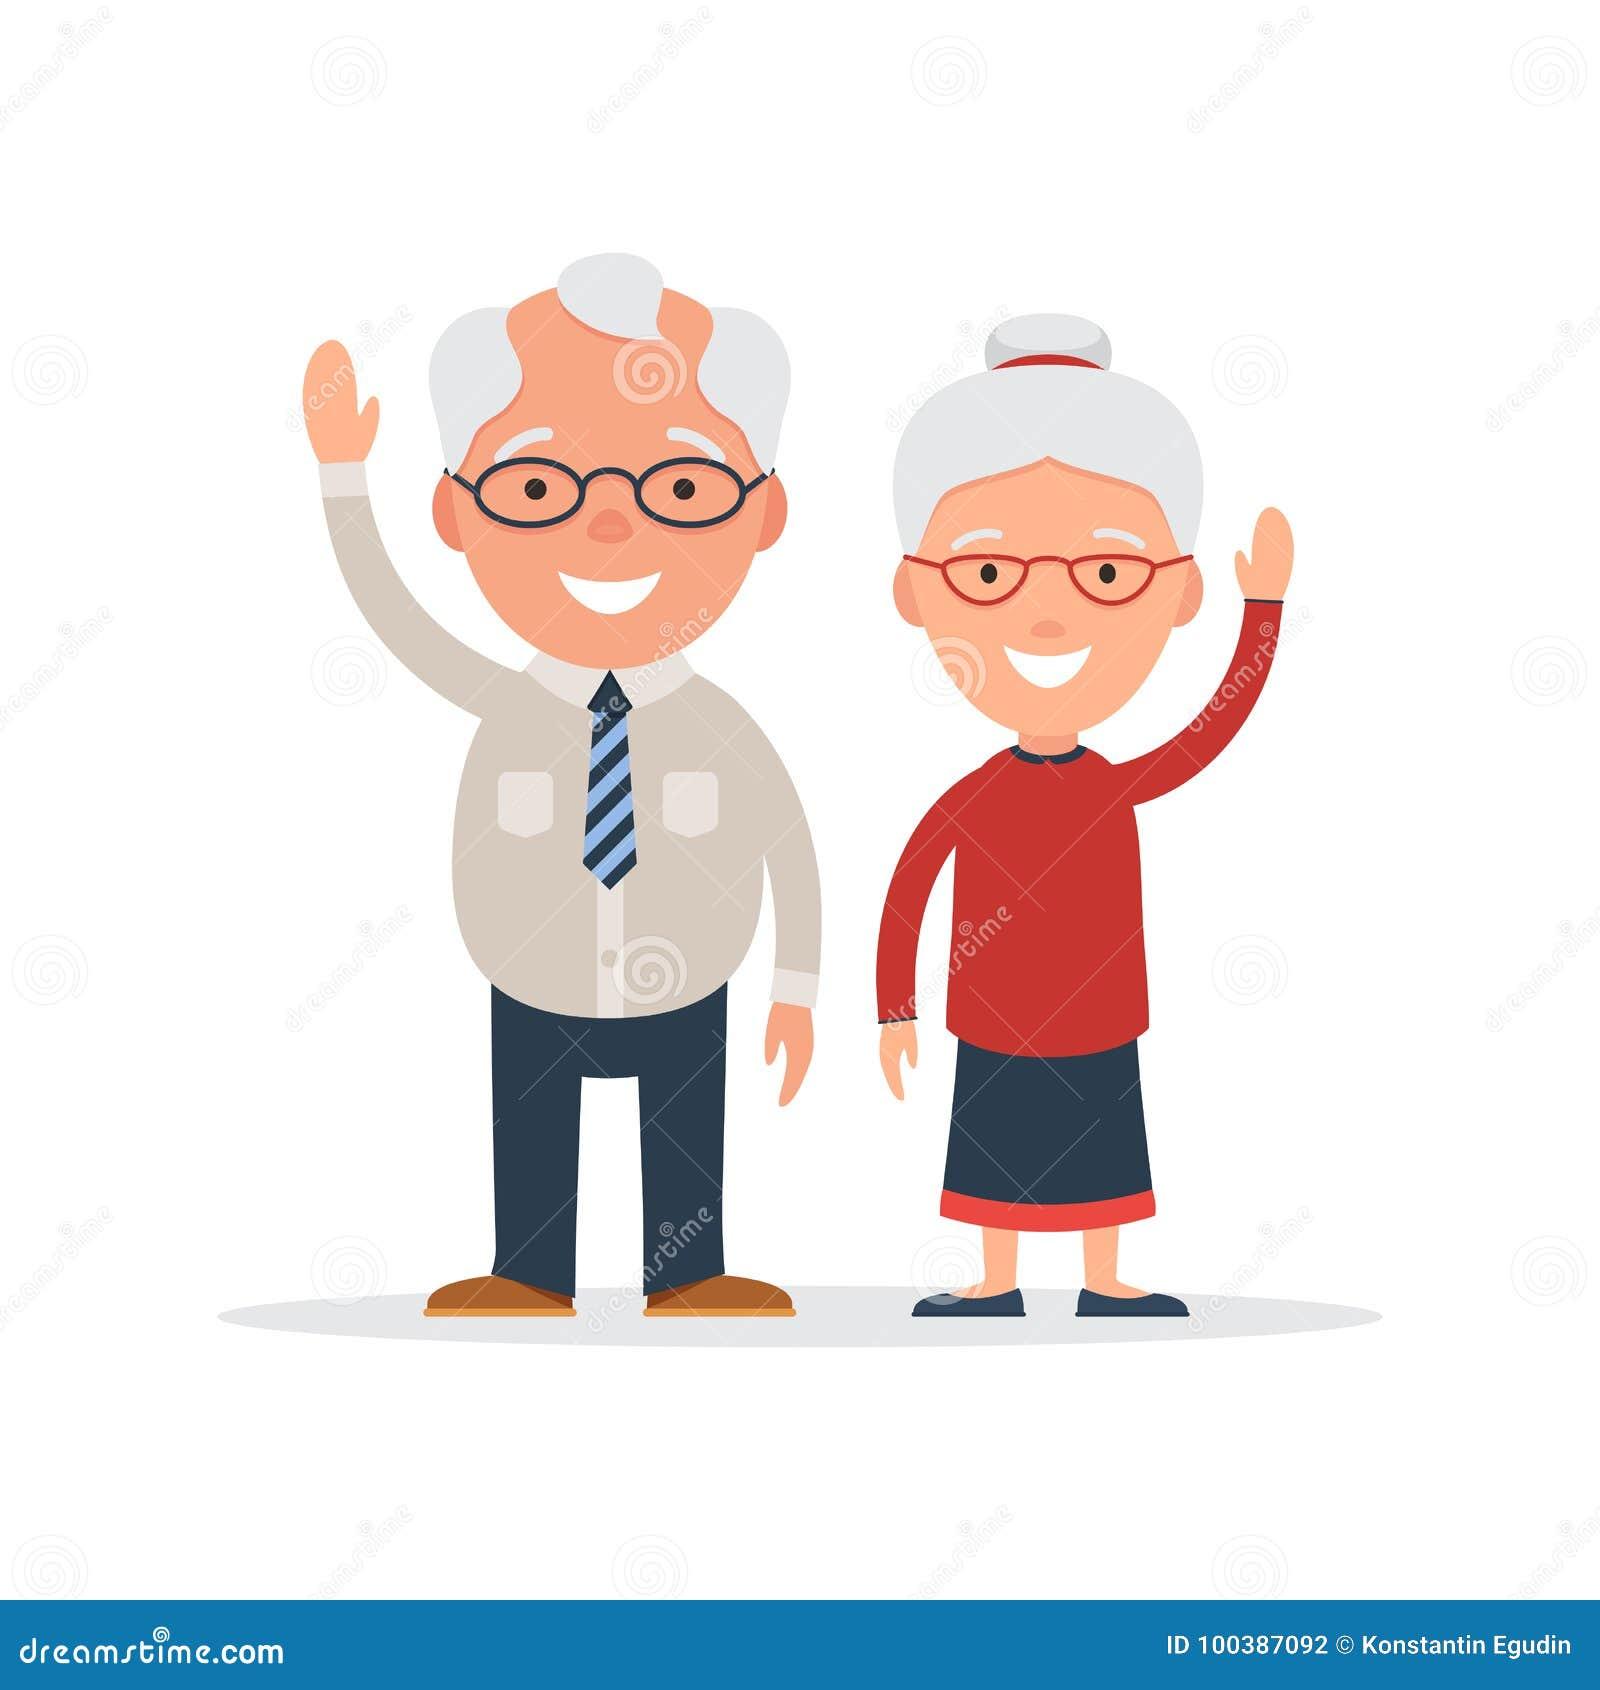 Wishes to Grandpa Happy Elderly Man 60